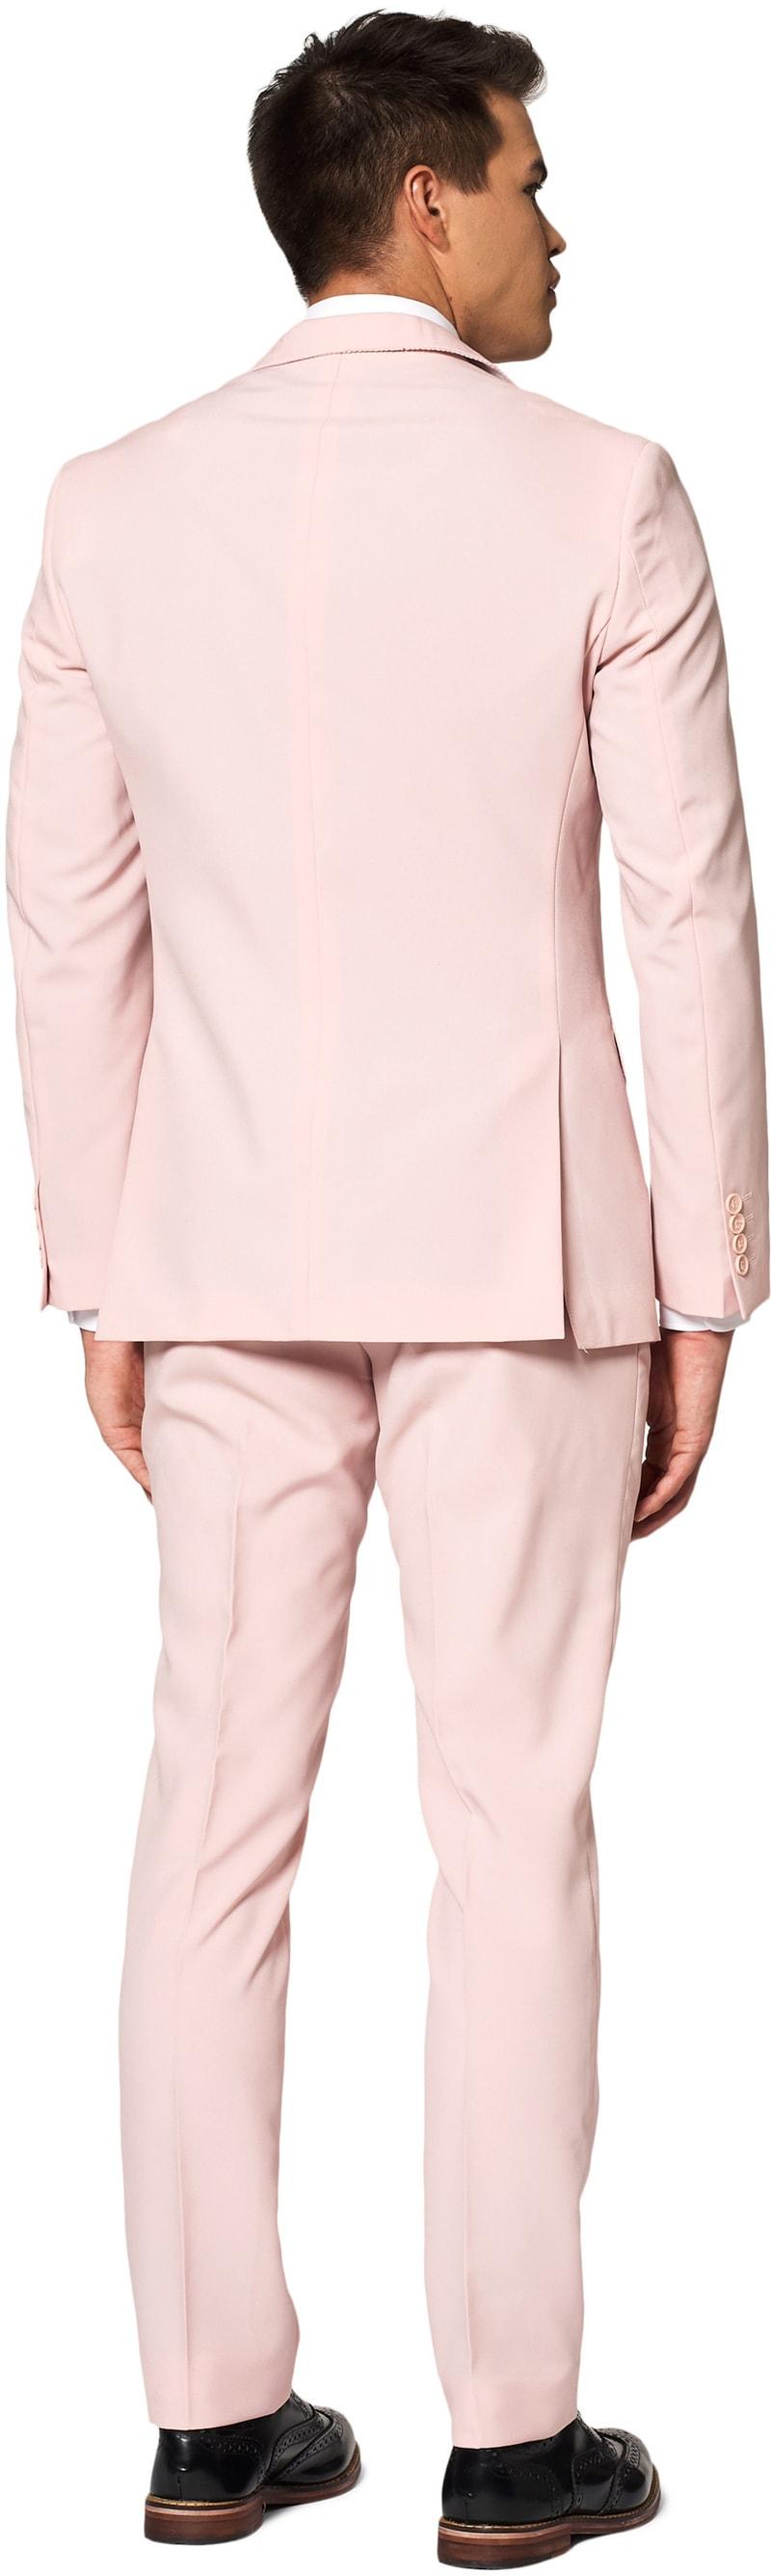 OppoSuits Anzug Lush Blush Foto 1